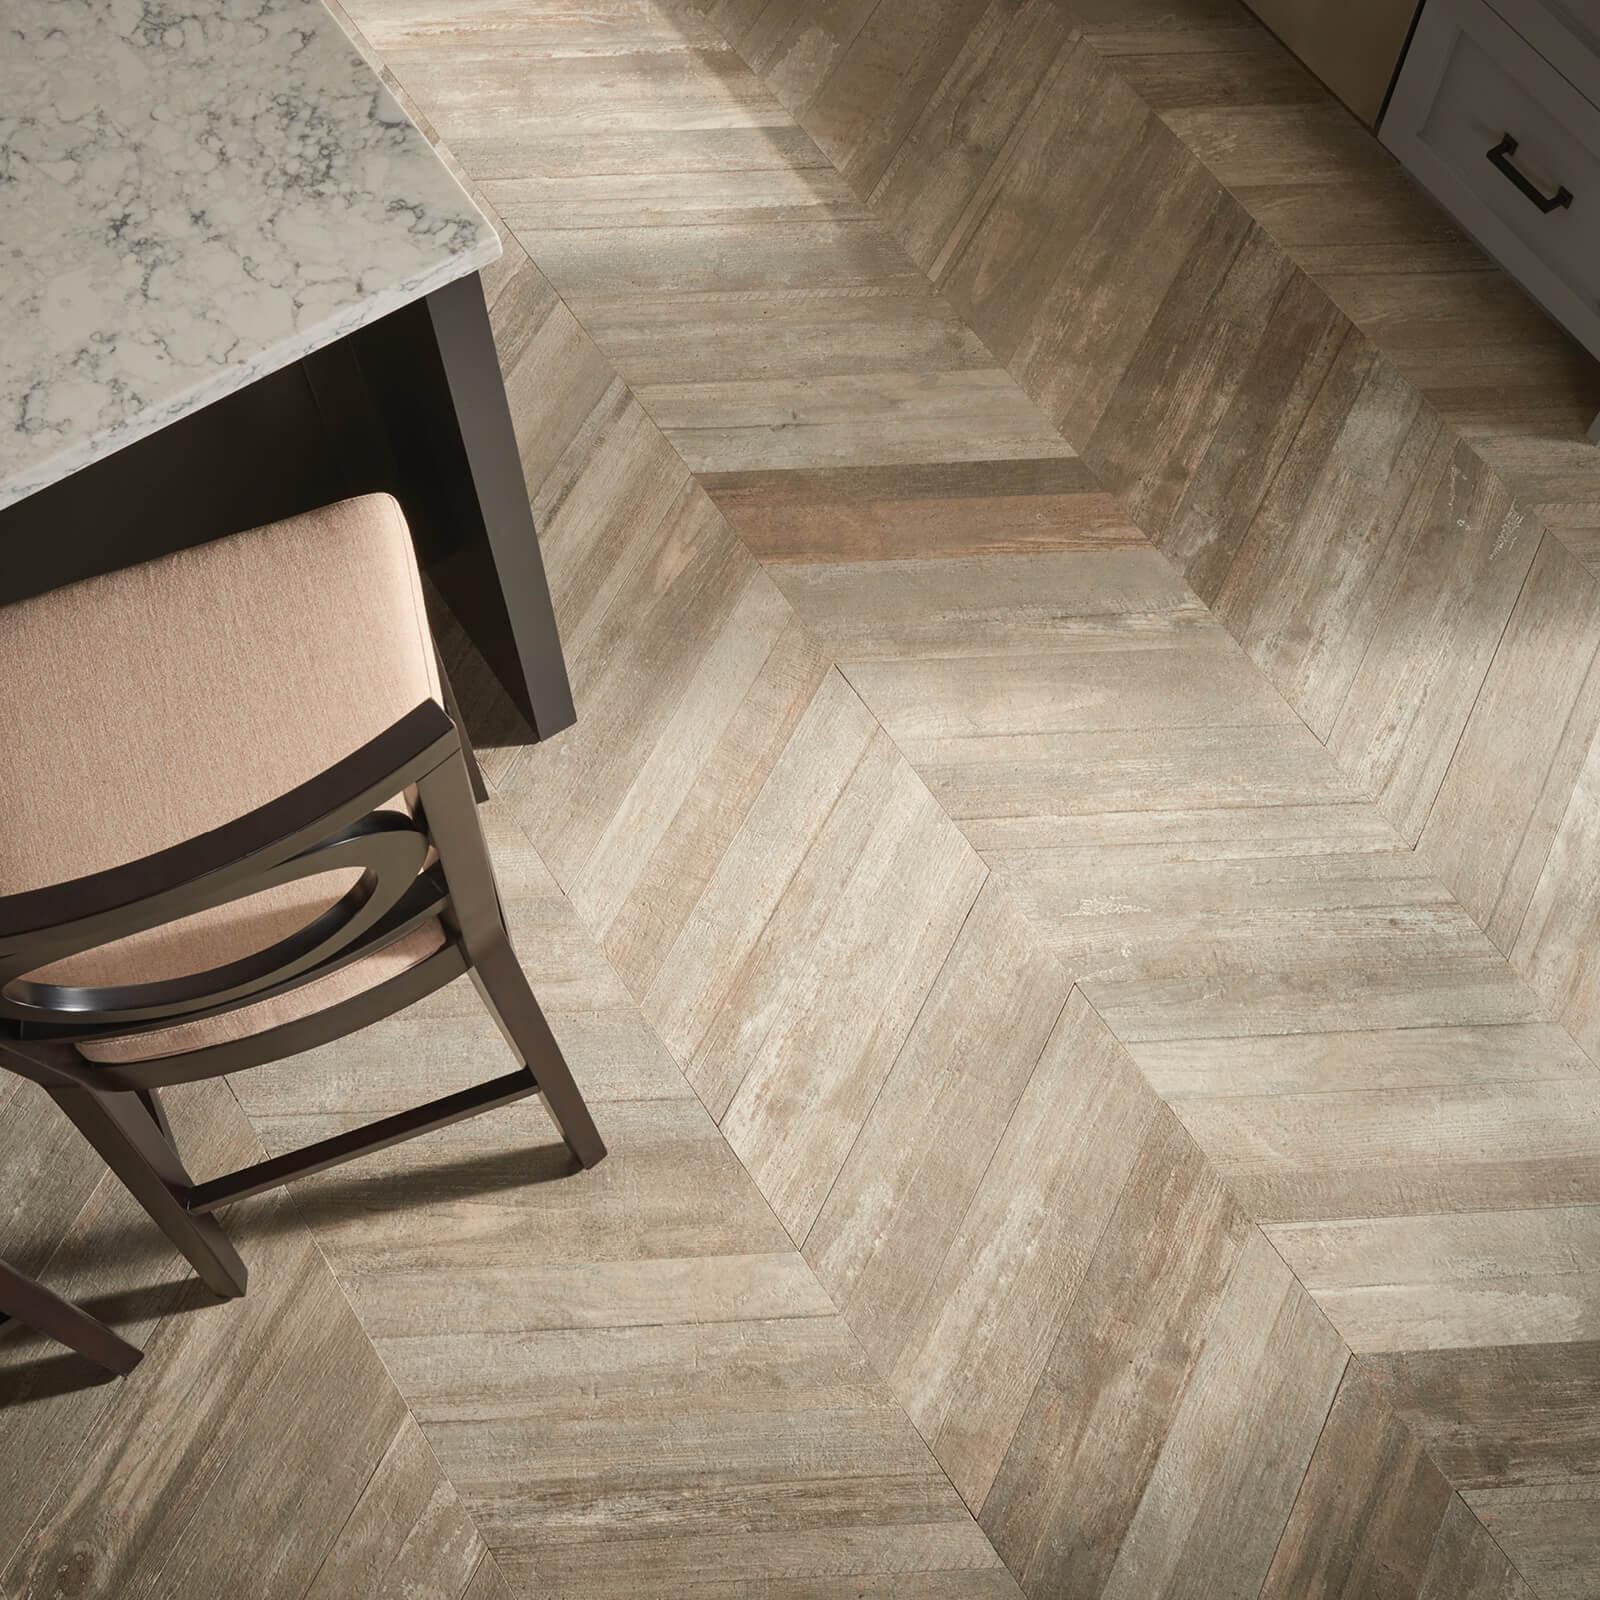 Tile flooring | Flooring 101